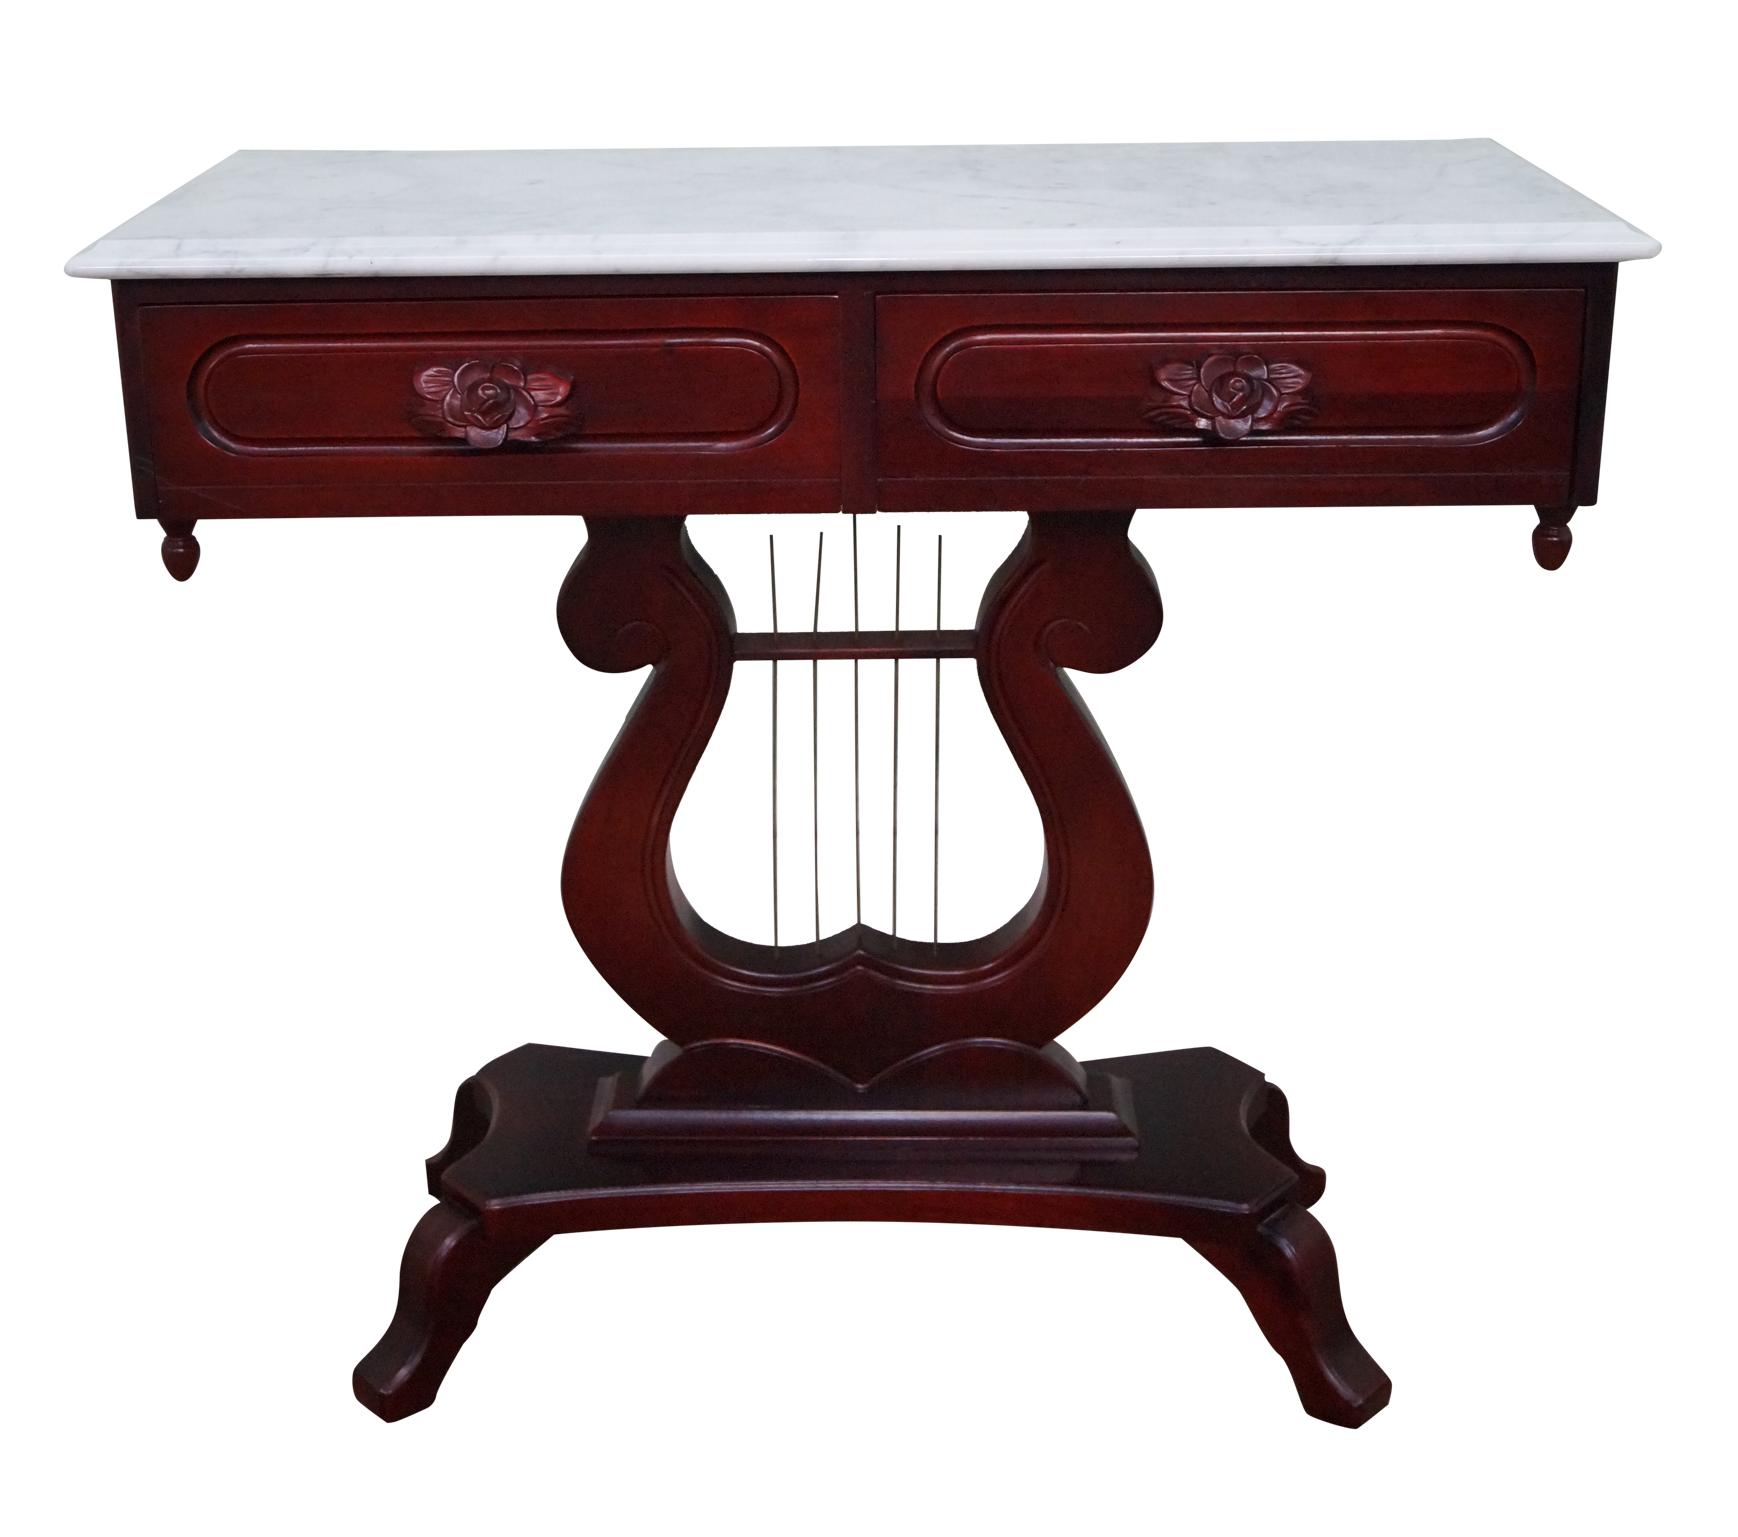 Kimball Solid Mahogany Victorian Style Console